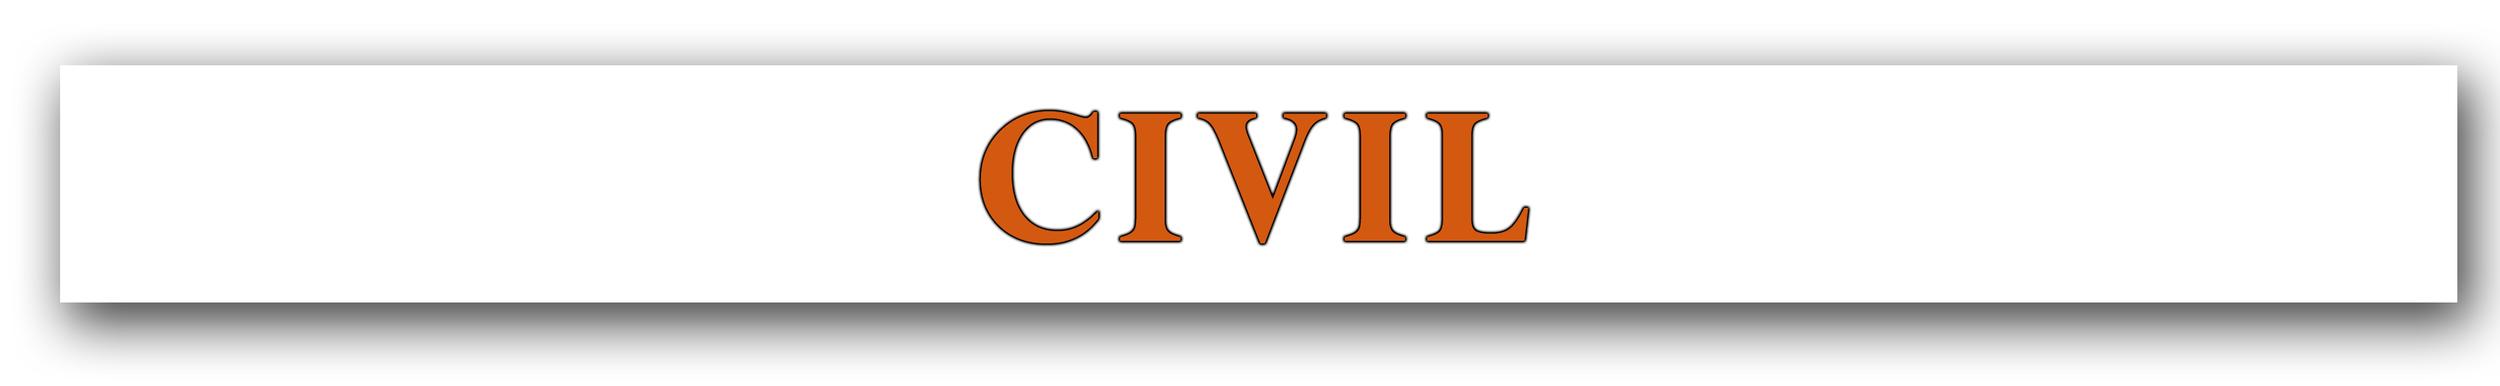 Civil 2 copy.jpg